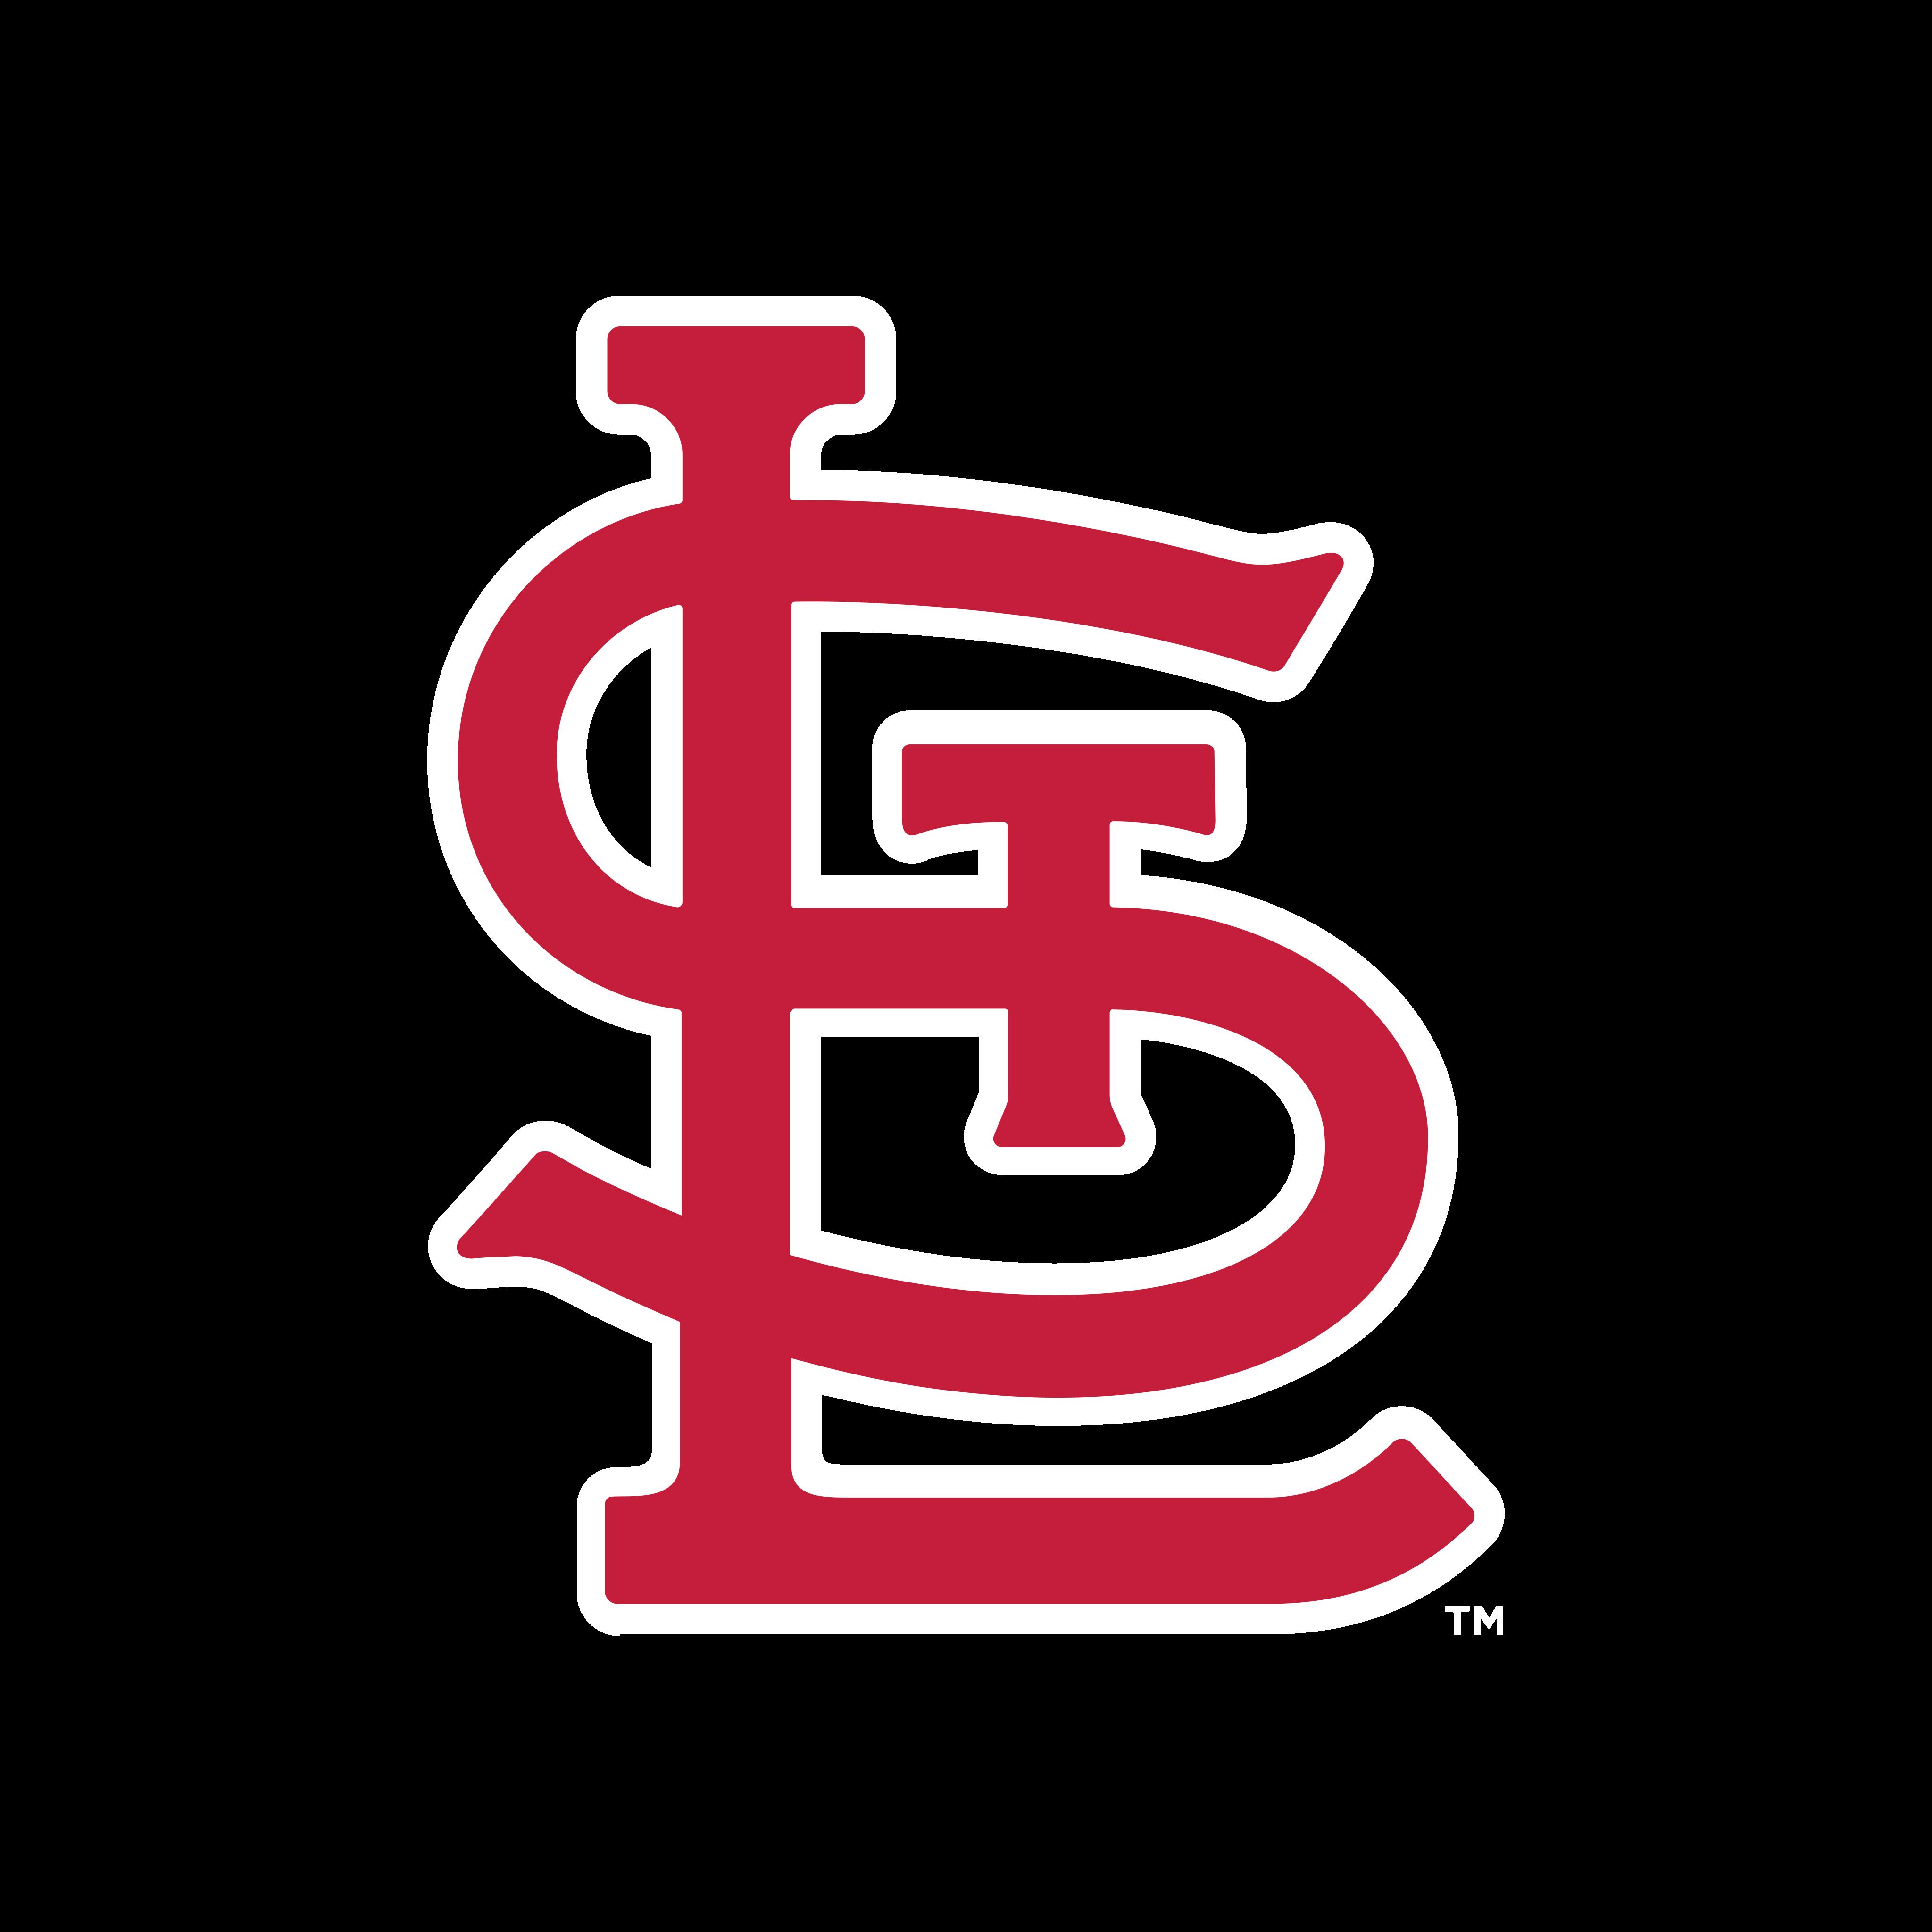 st louis cardinals logo 0 - St. Louis Cardinals Logo